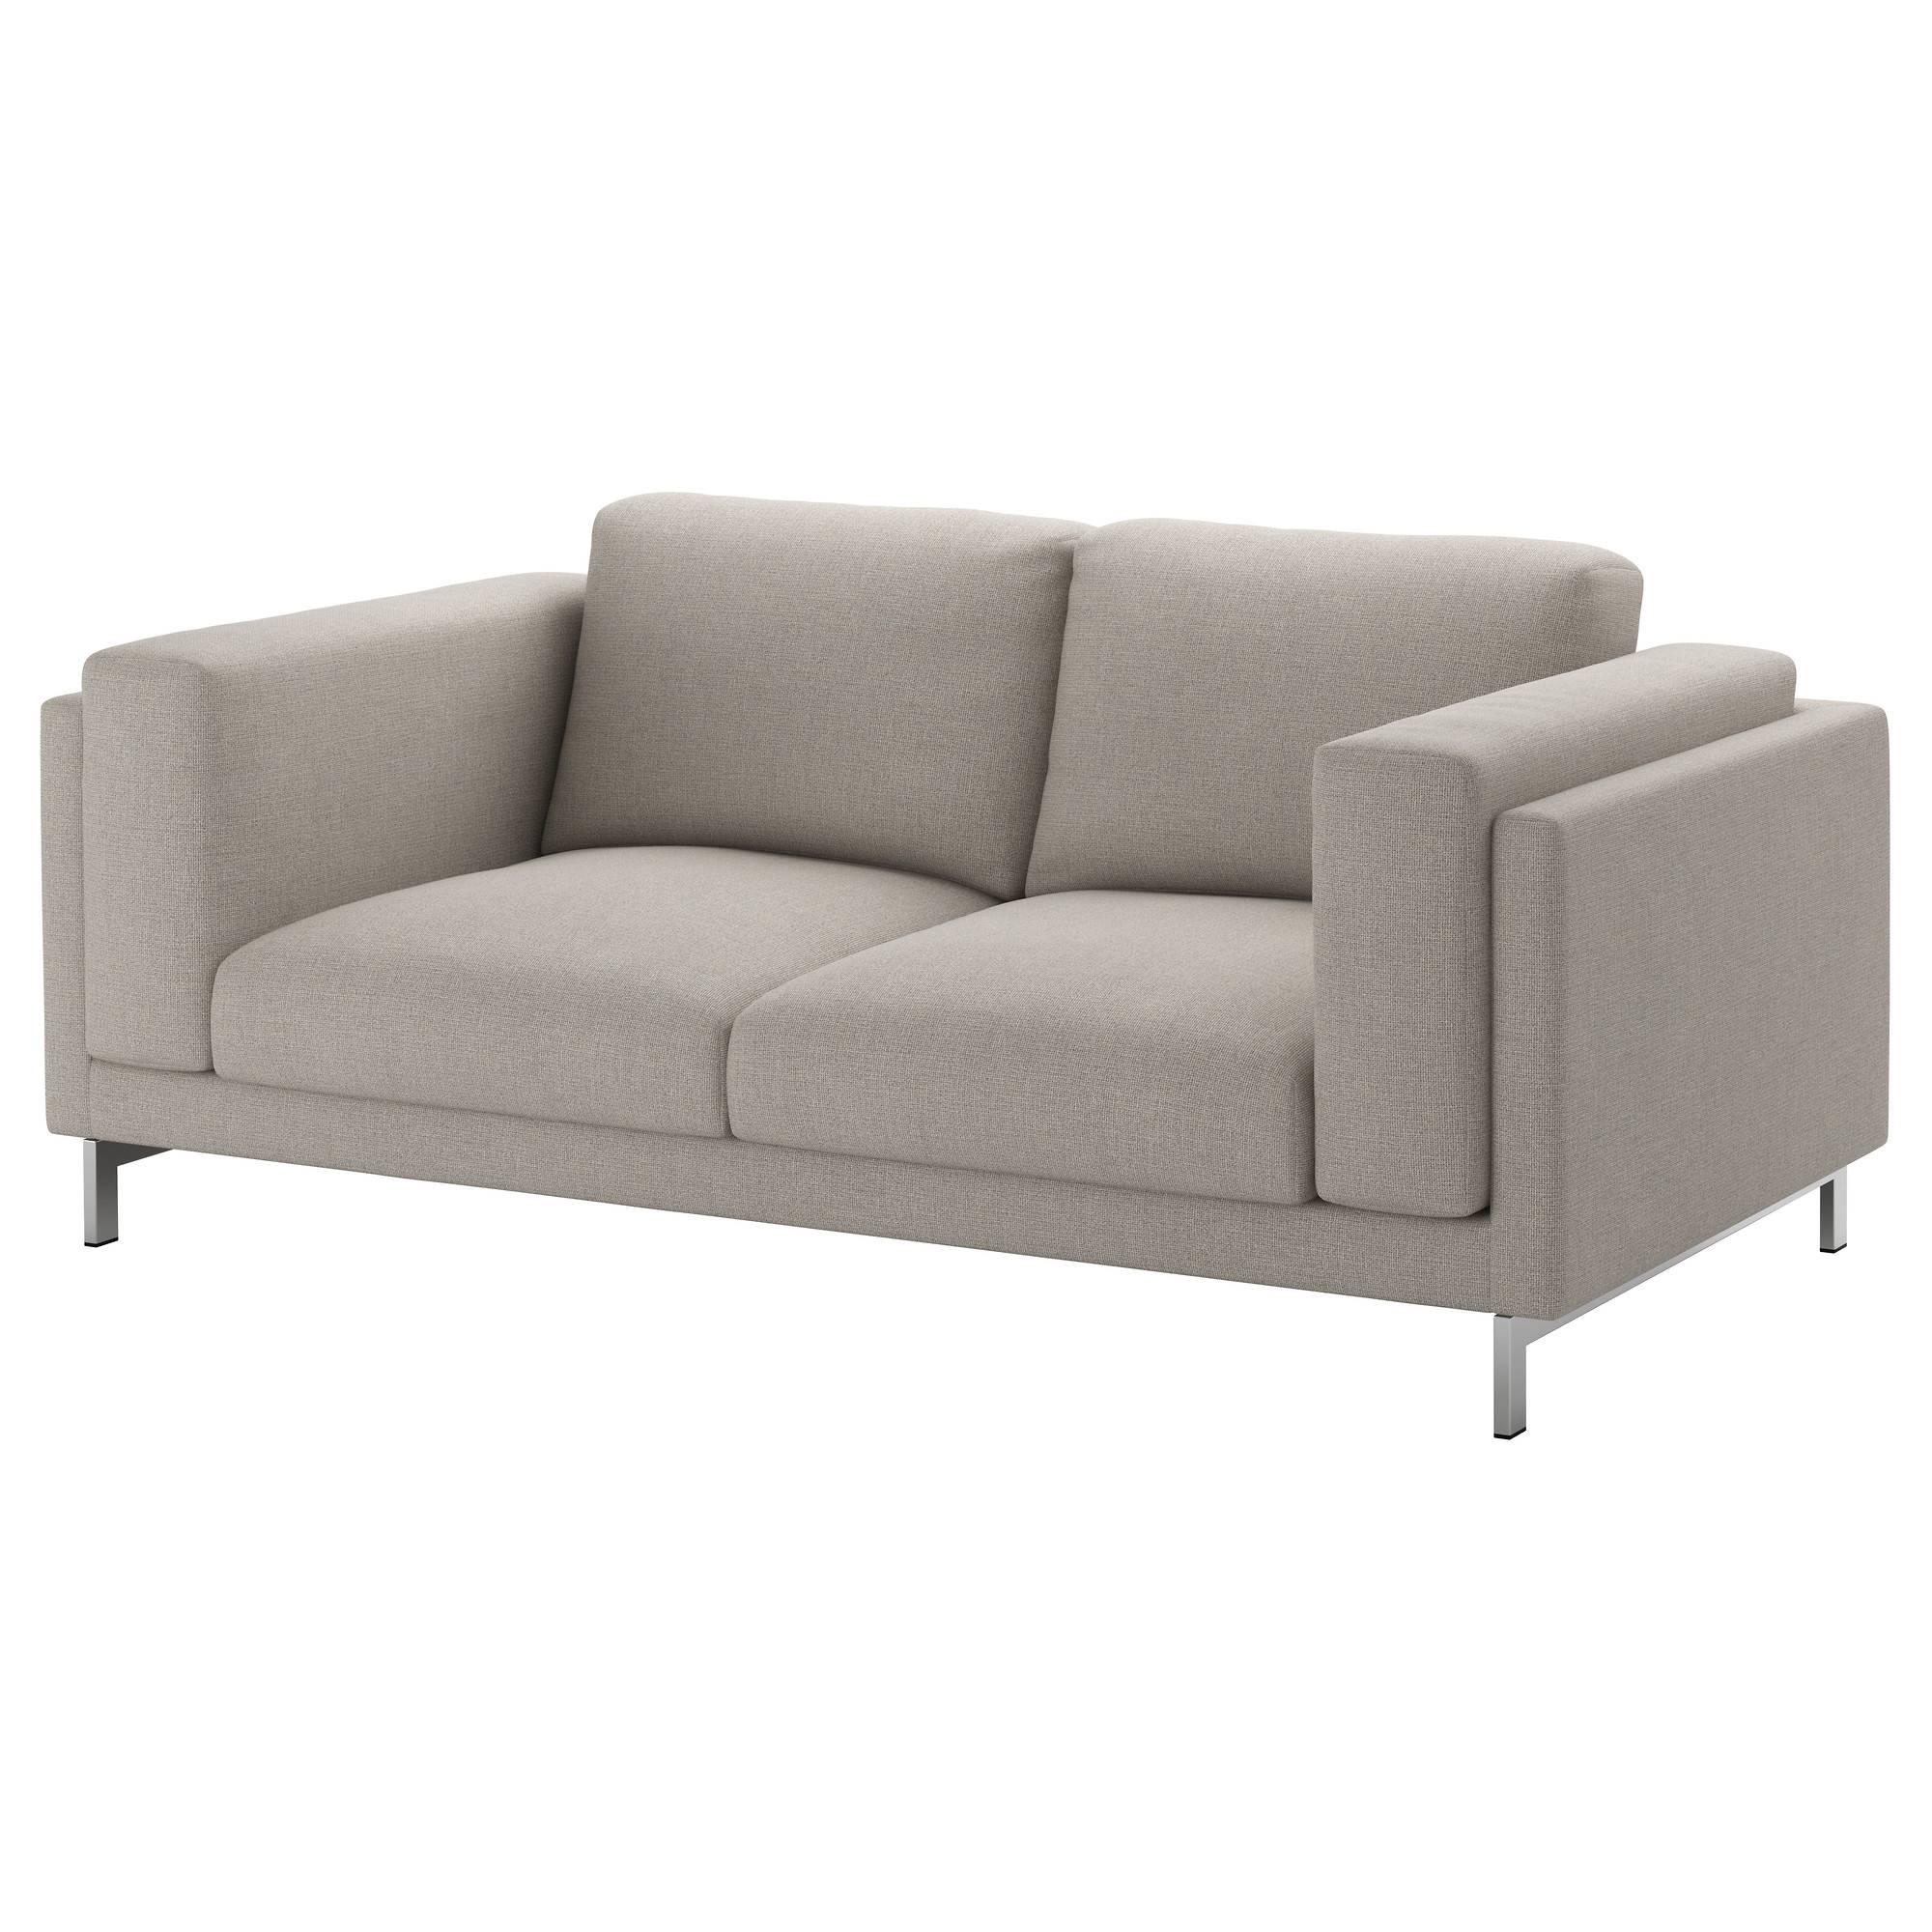 Nockeby Two-Seat Sofa Tenö Light Grey/chrome-Plated - Ikea regarding Ikea Two Seater Sofas (Image 17 of 30)